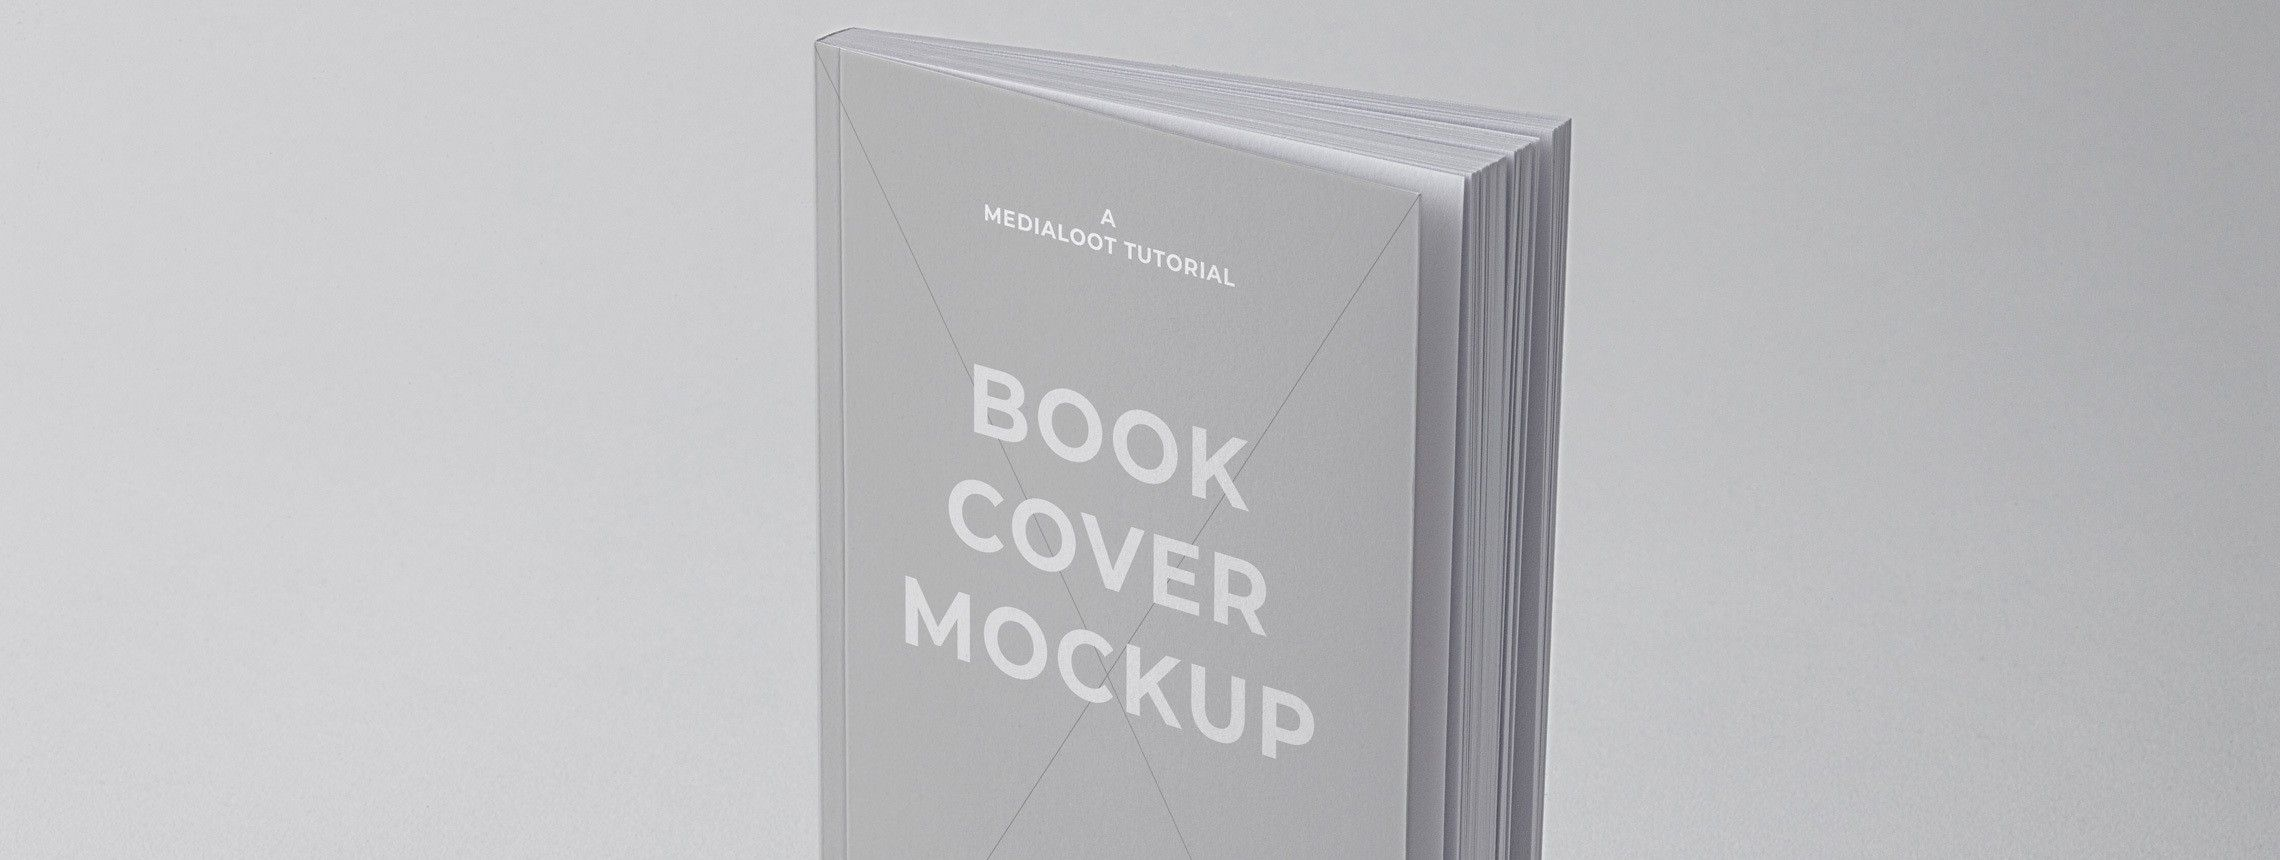 Easy Mockups Make A Book Mockup Book Making Book Cover Mockup Graphic Design Programs